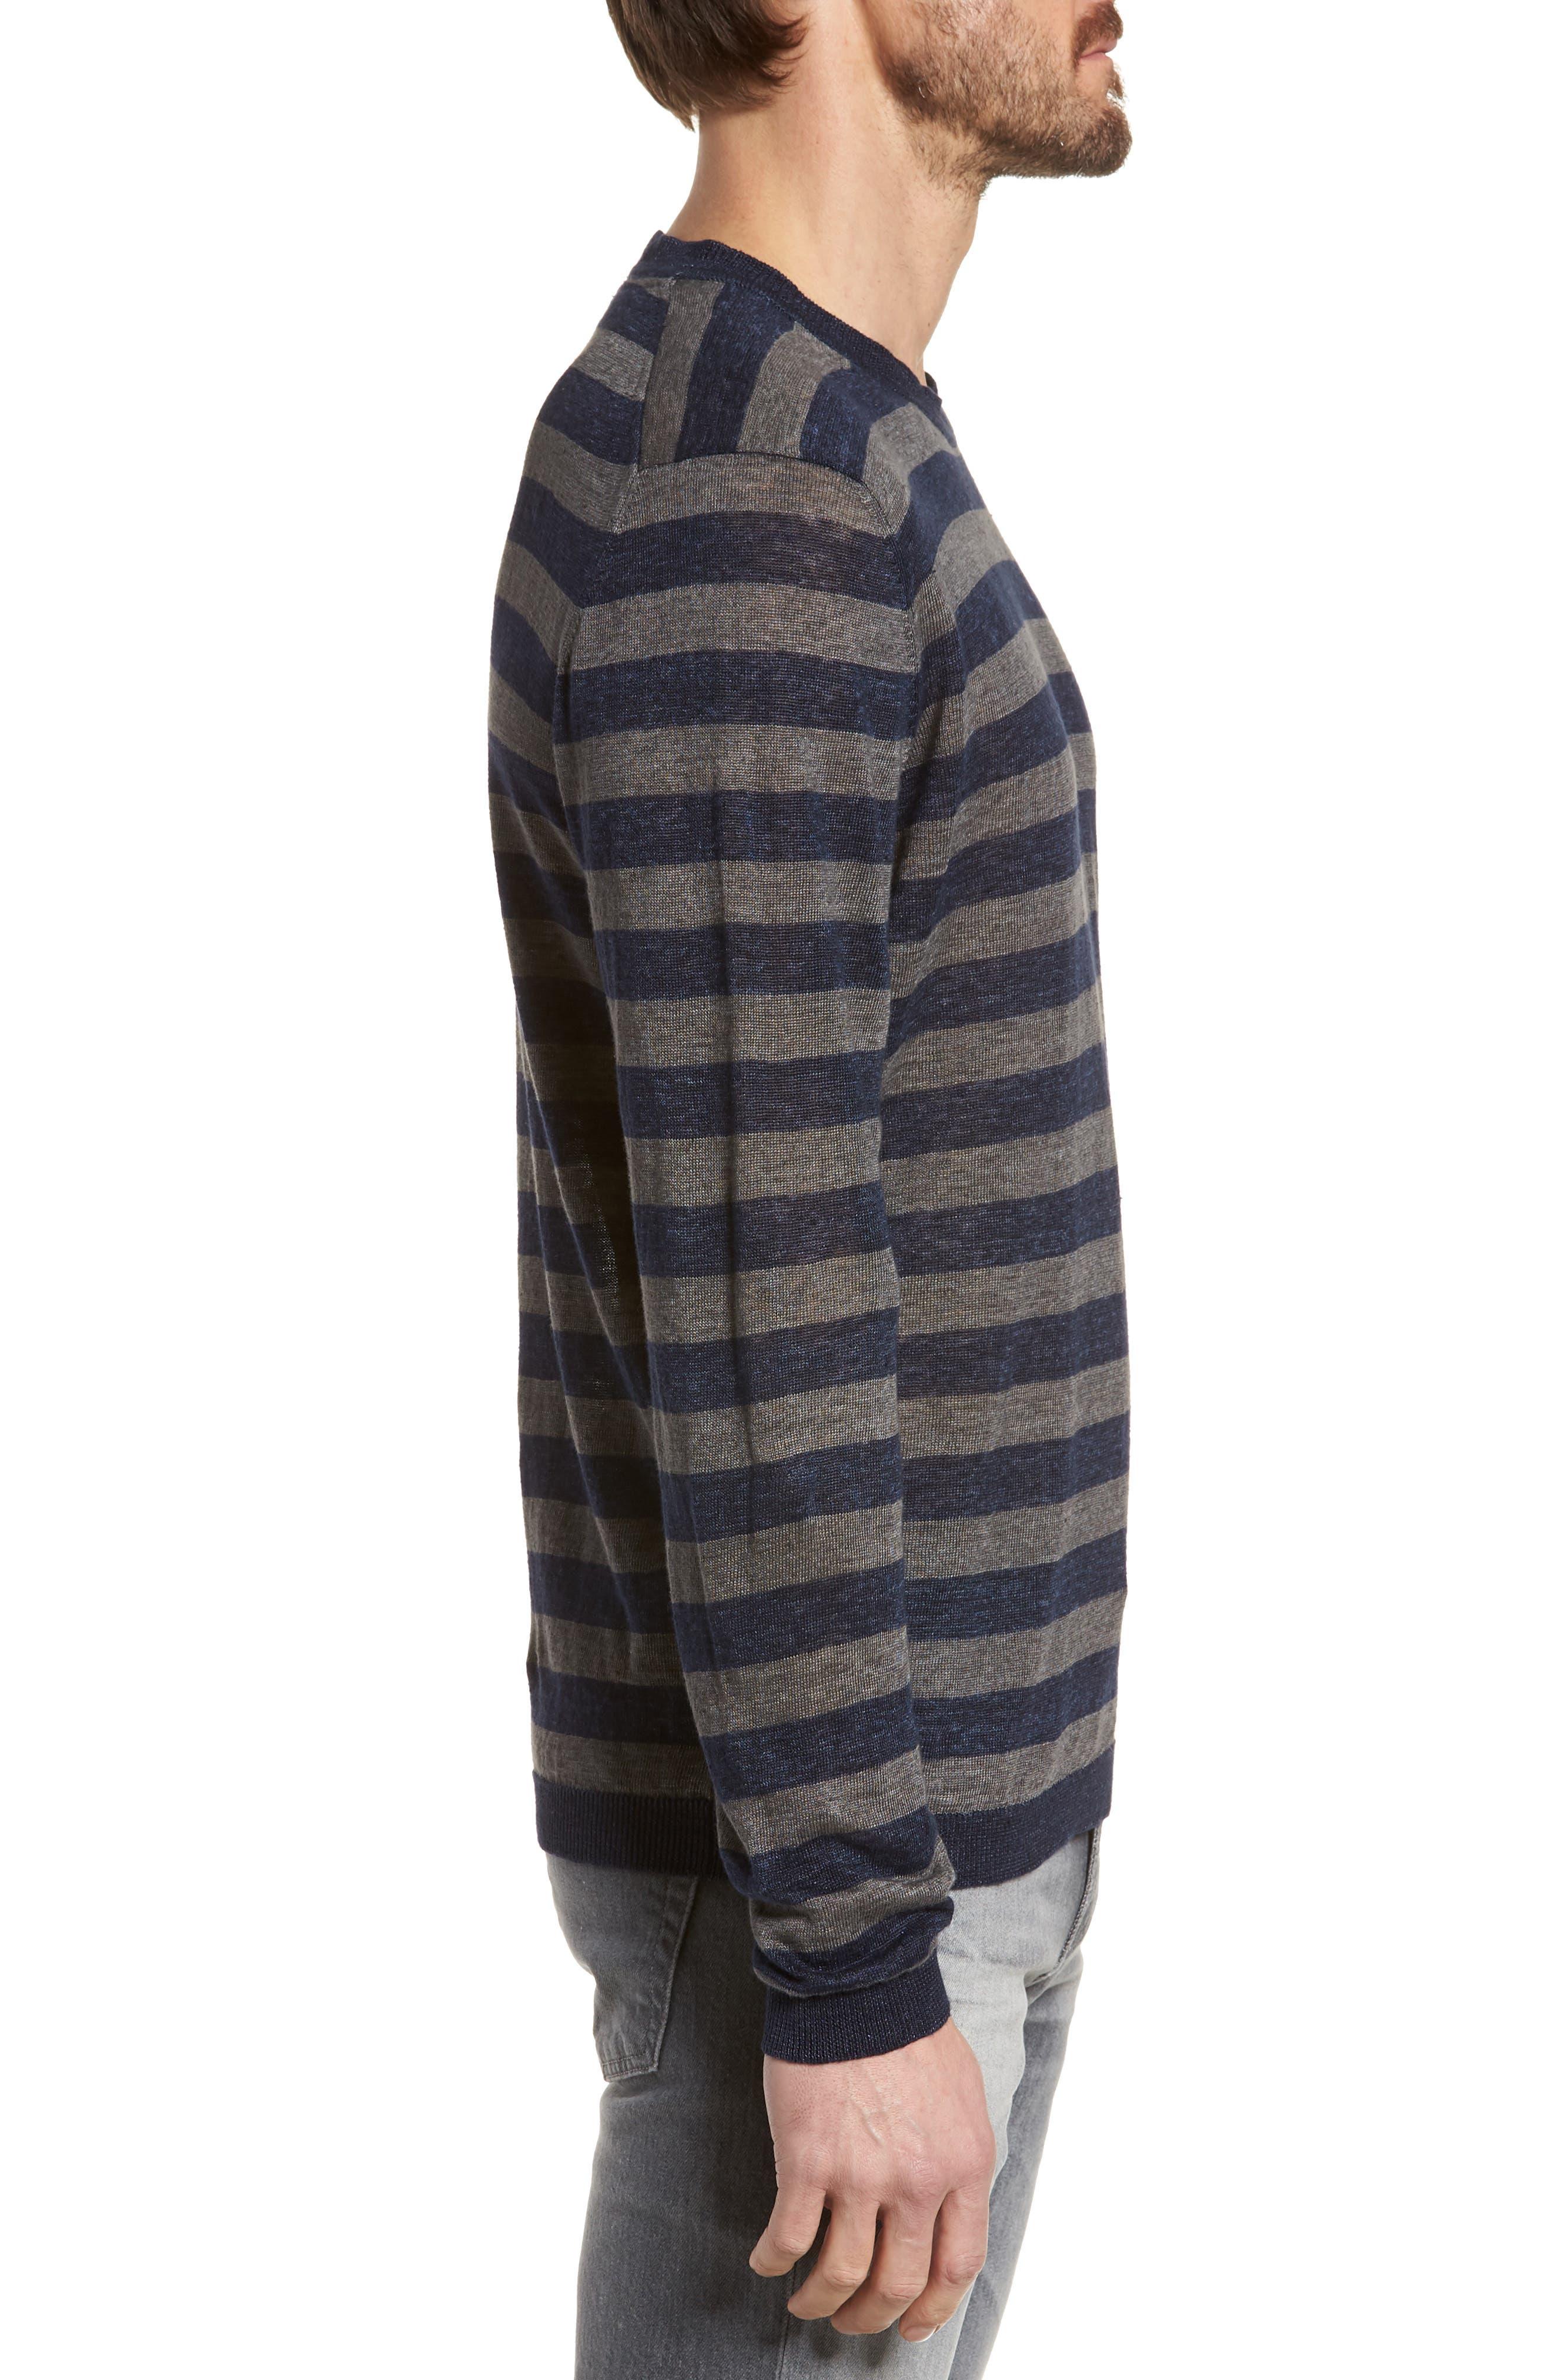 & Bros. Stripe Linen Sweater,                             Alternate thumbnail 3, color,                             Navy Stripe